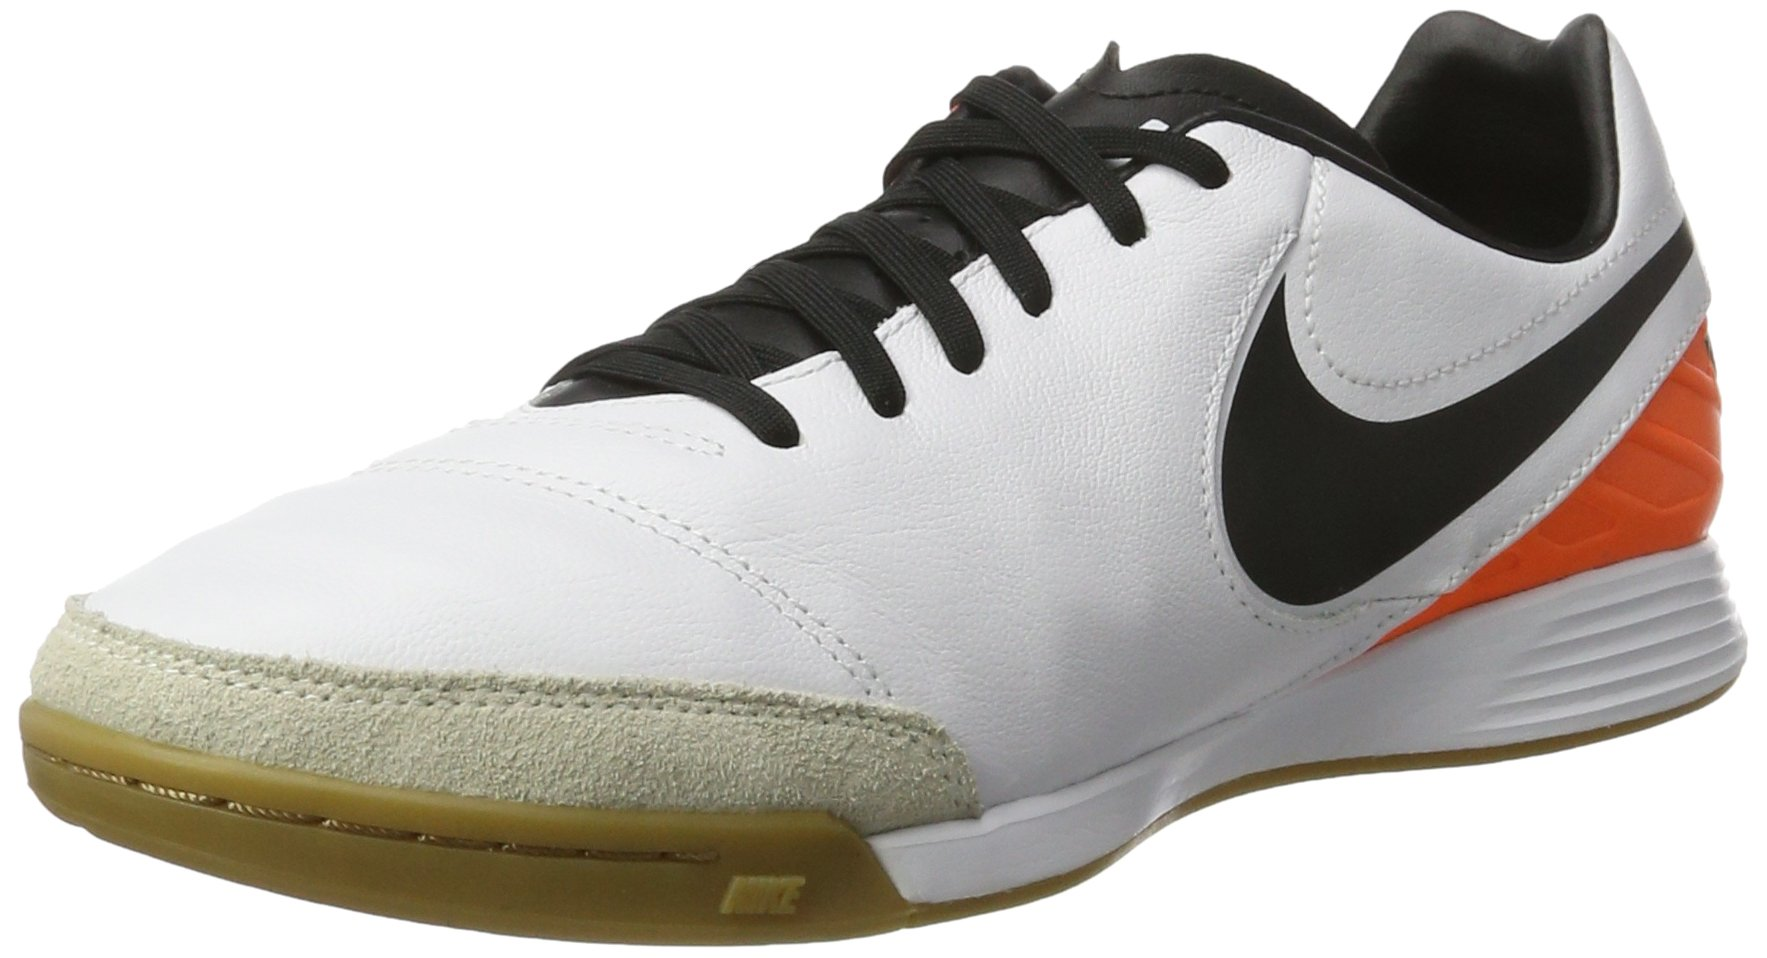 Tiempox HommeBlanc Ic Nike total Mystic black Eu Orange39 Chaussures De Football CasséBlancowhite V E2W9DIH